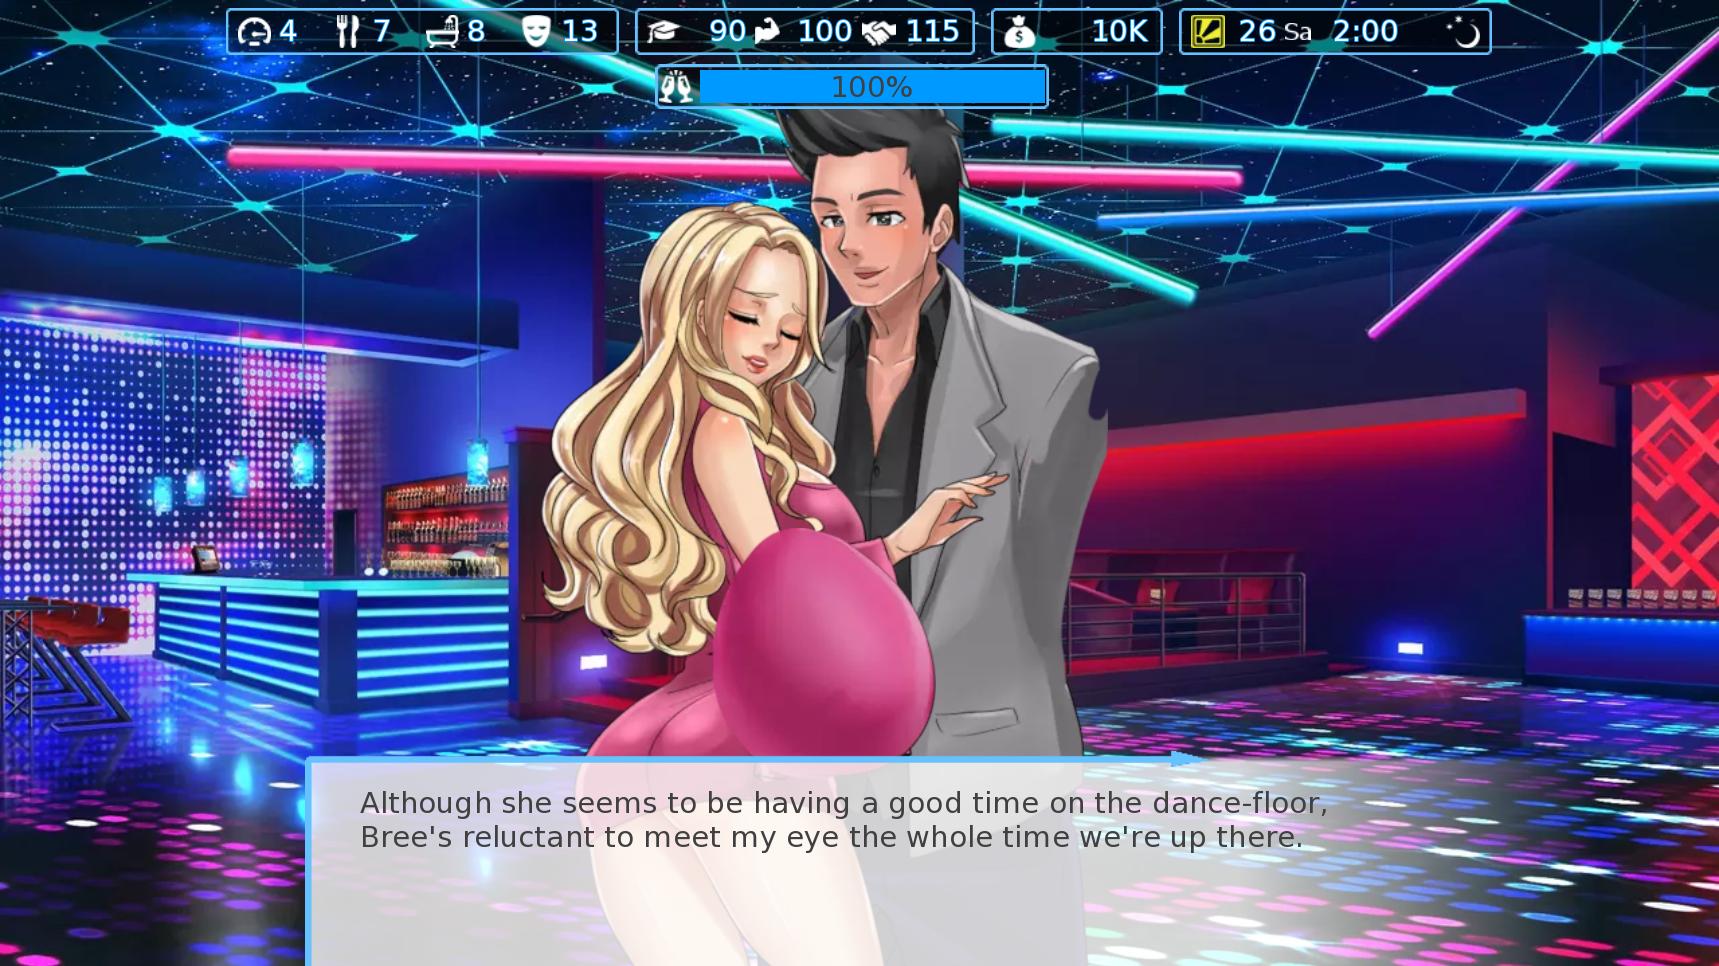 Game dating walkthrough kylie Dating kylie